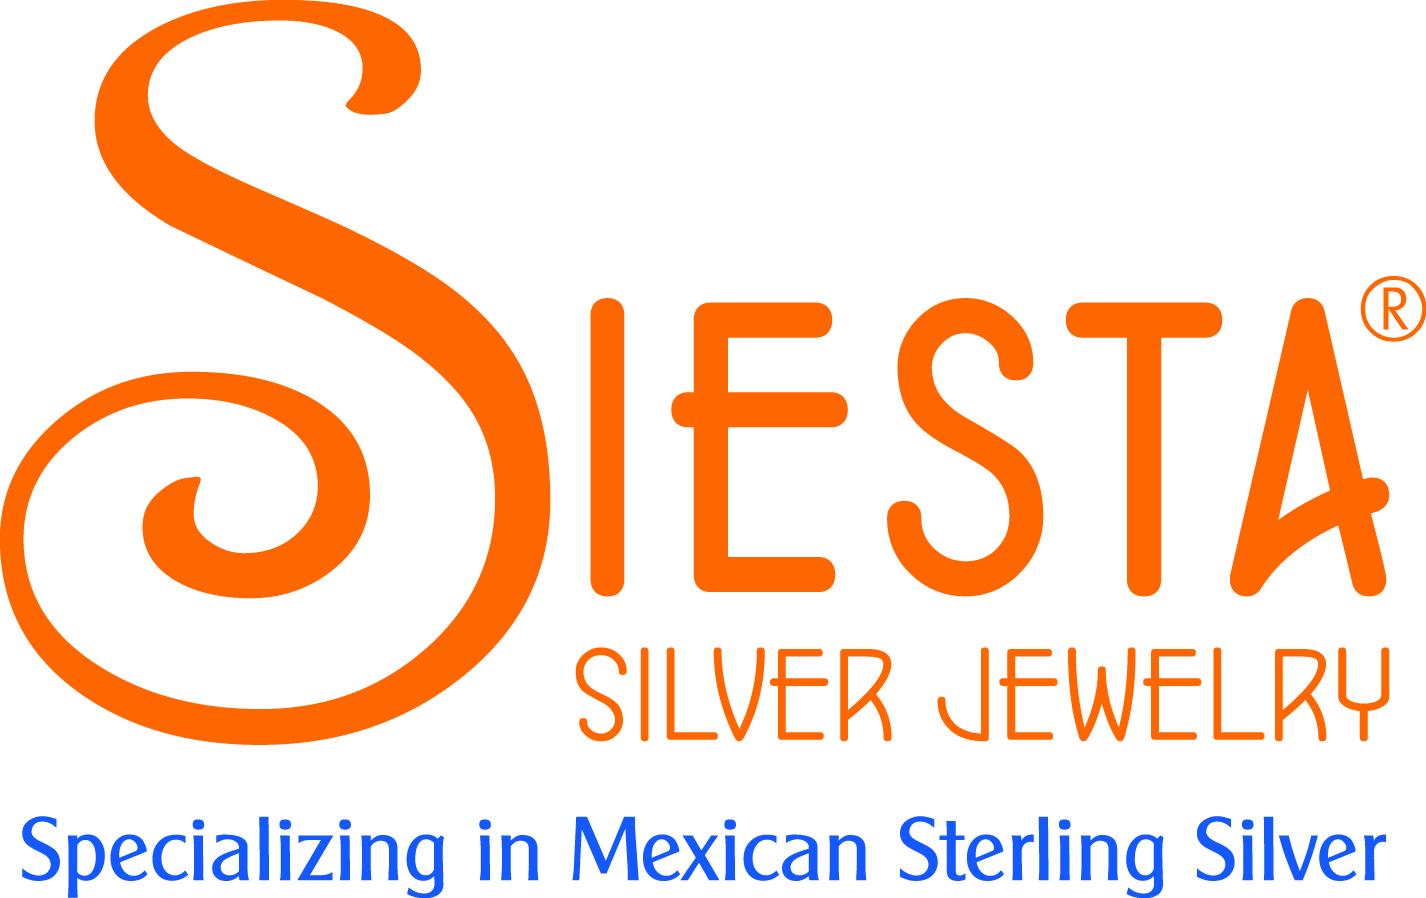 Siesta-Final-Logo-orangeR